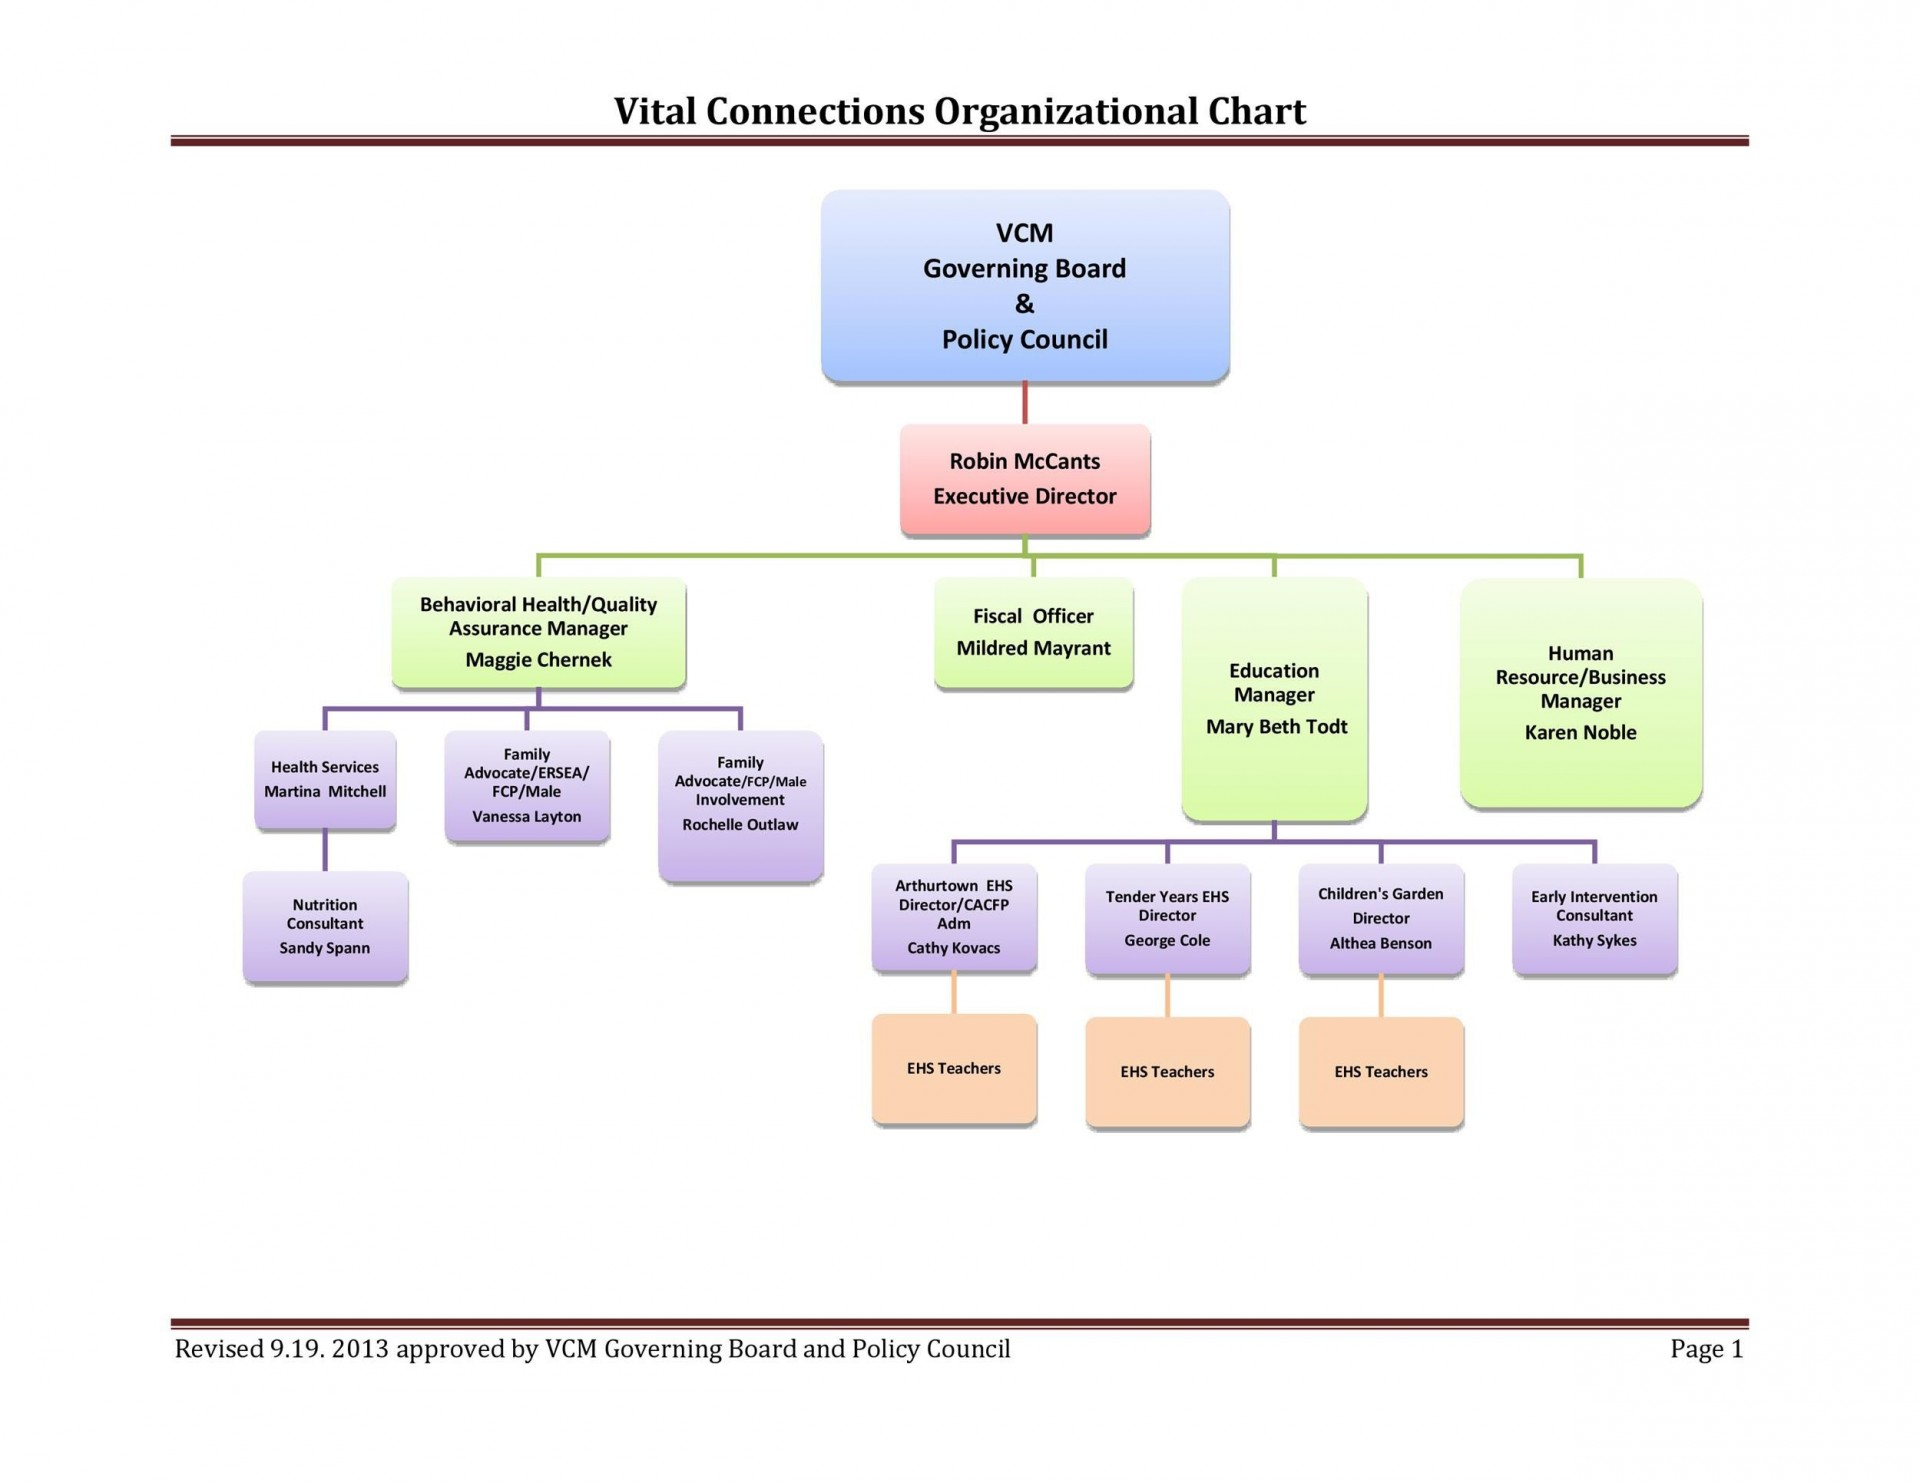 006 Beautiful Free Organizational Chart Template Excel 2010 Idea 1920